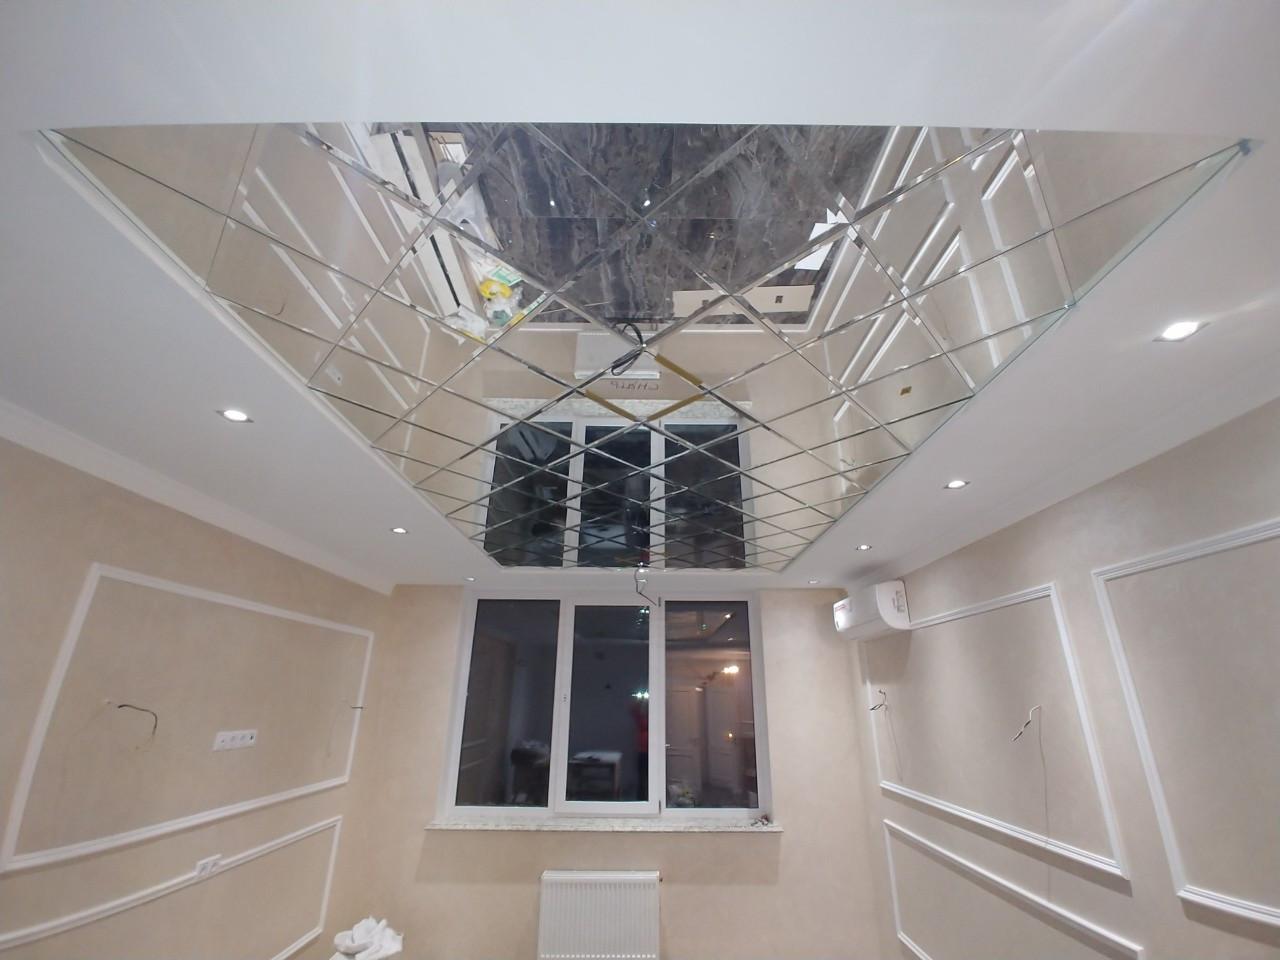 потолок зеркало фото капуста